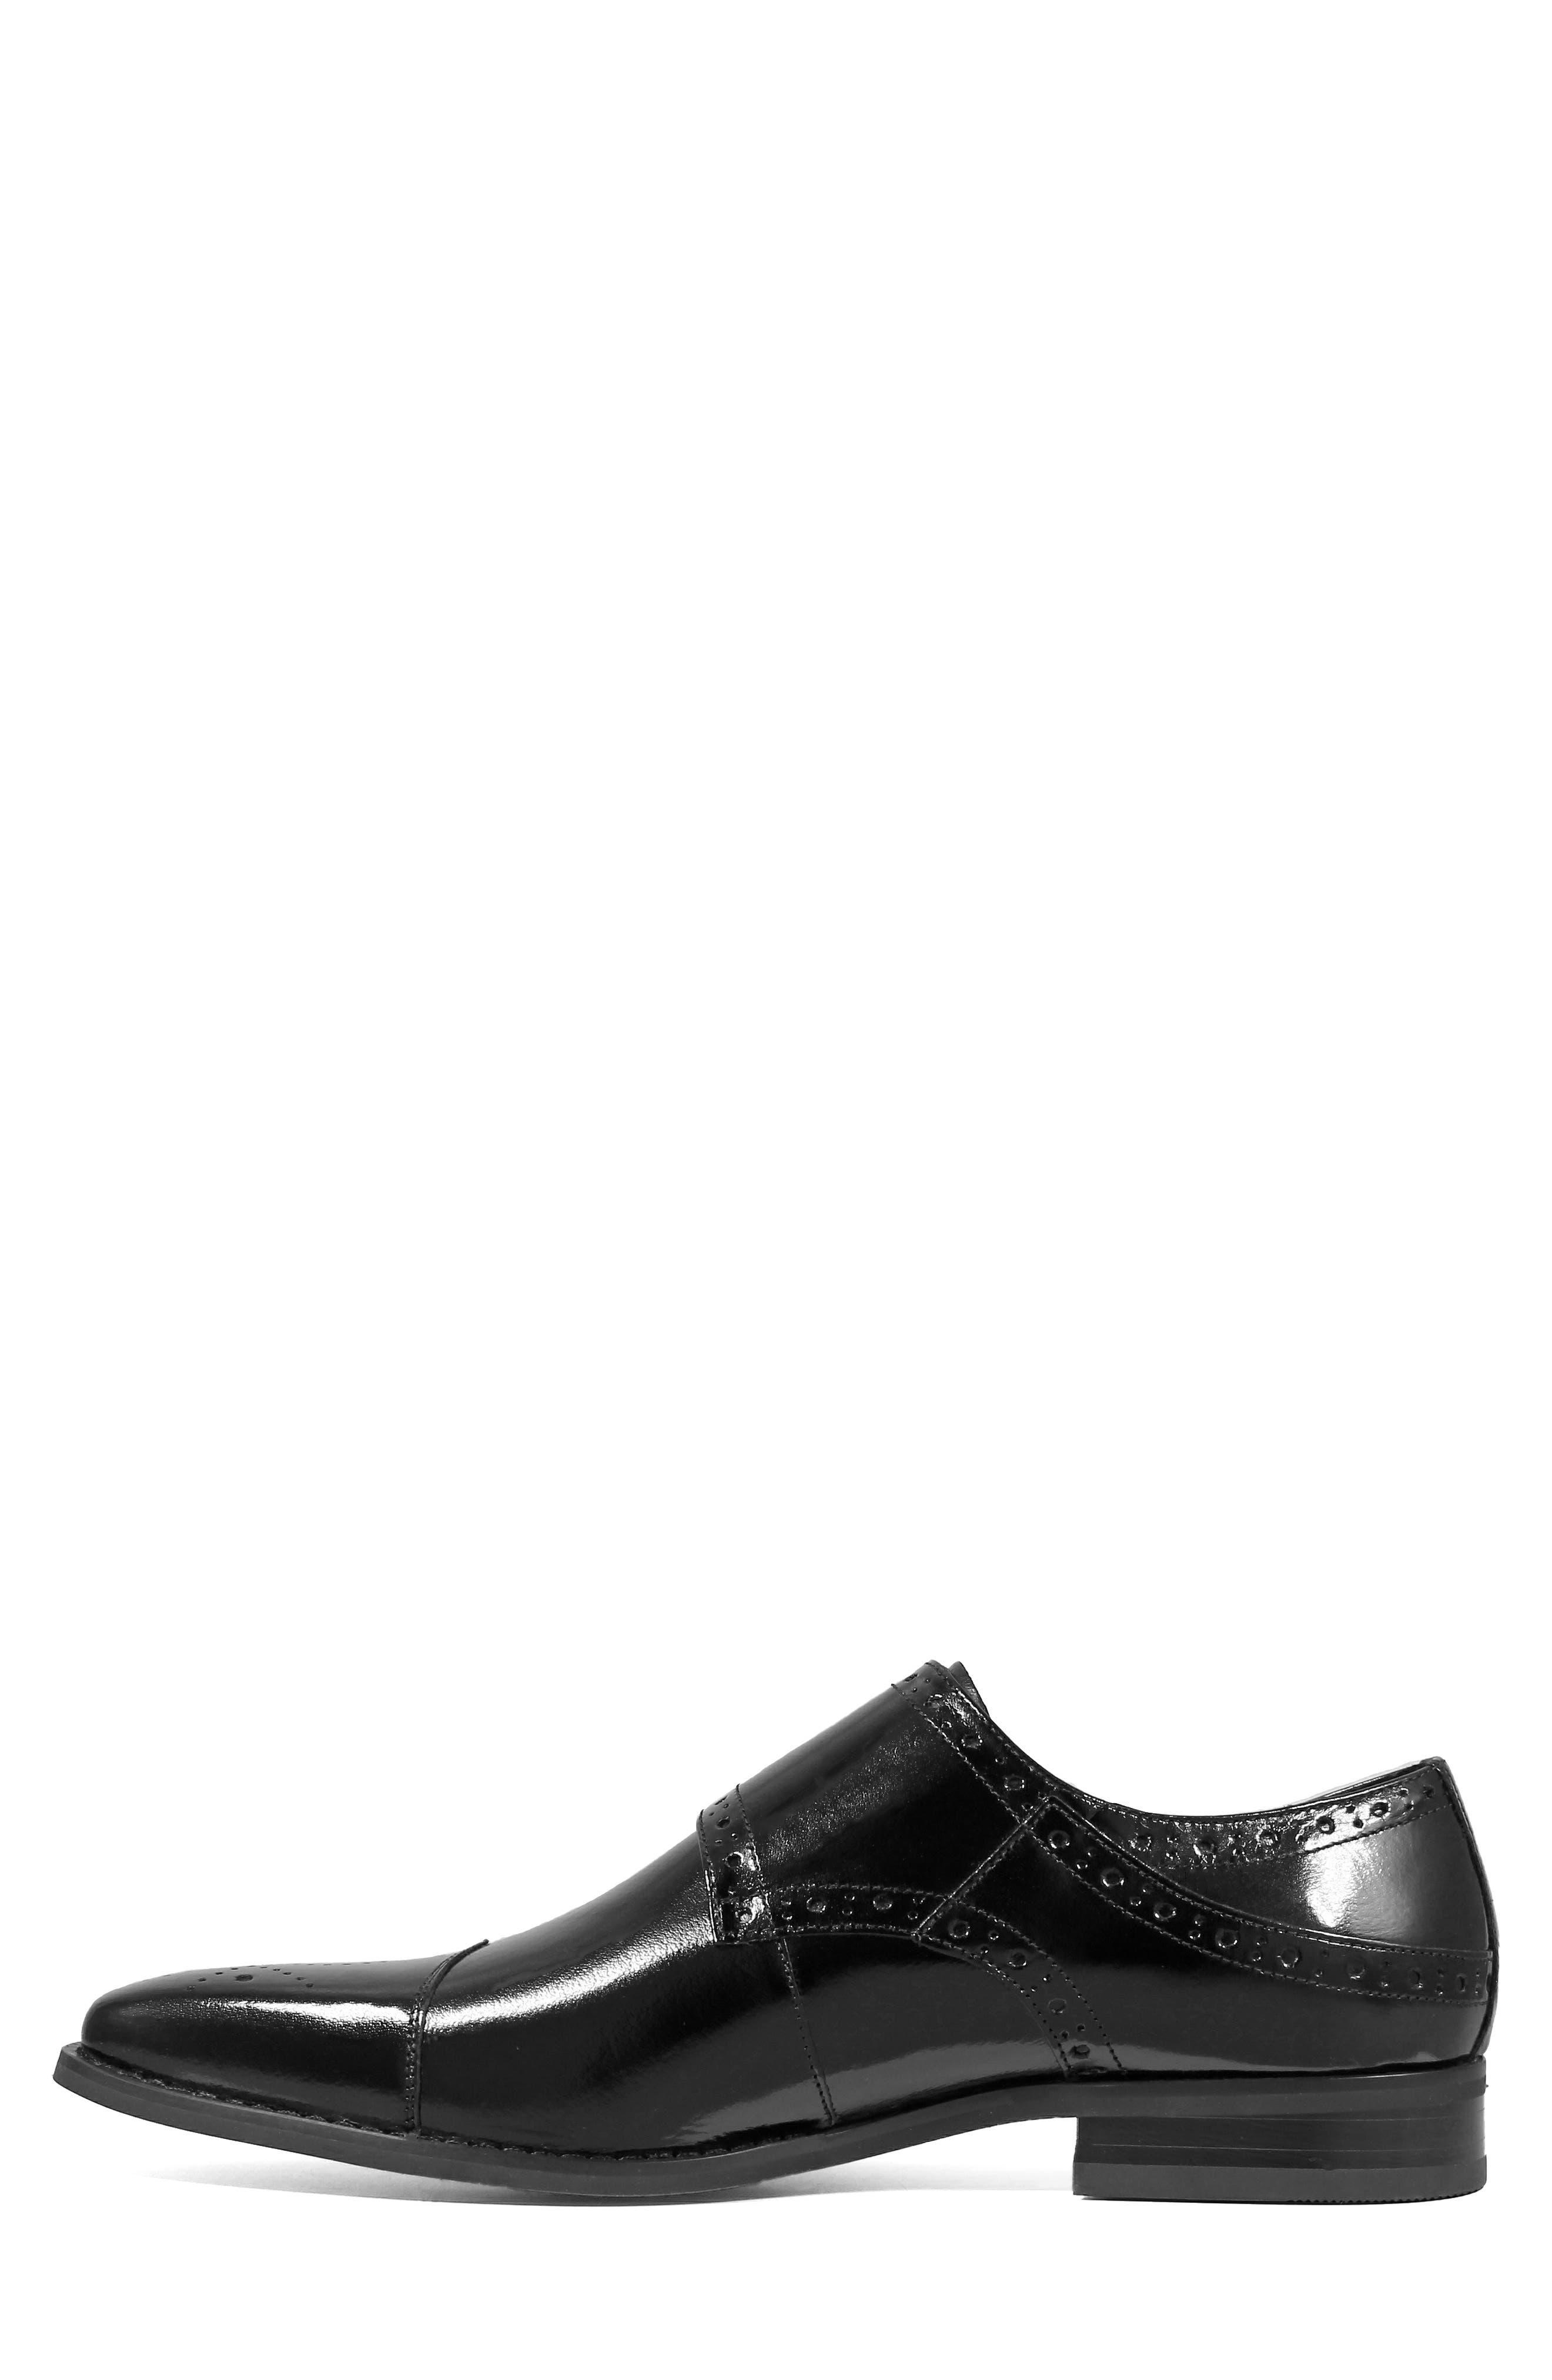 Tayton Cap Toe Double Strap Monk Shoe,                             Alternate thumbnail 7, color,                             001